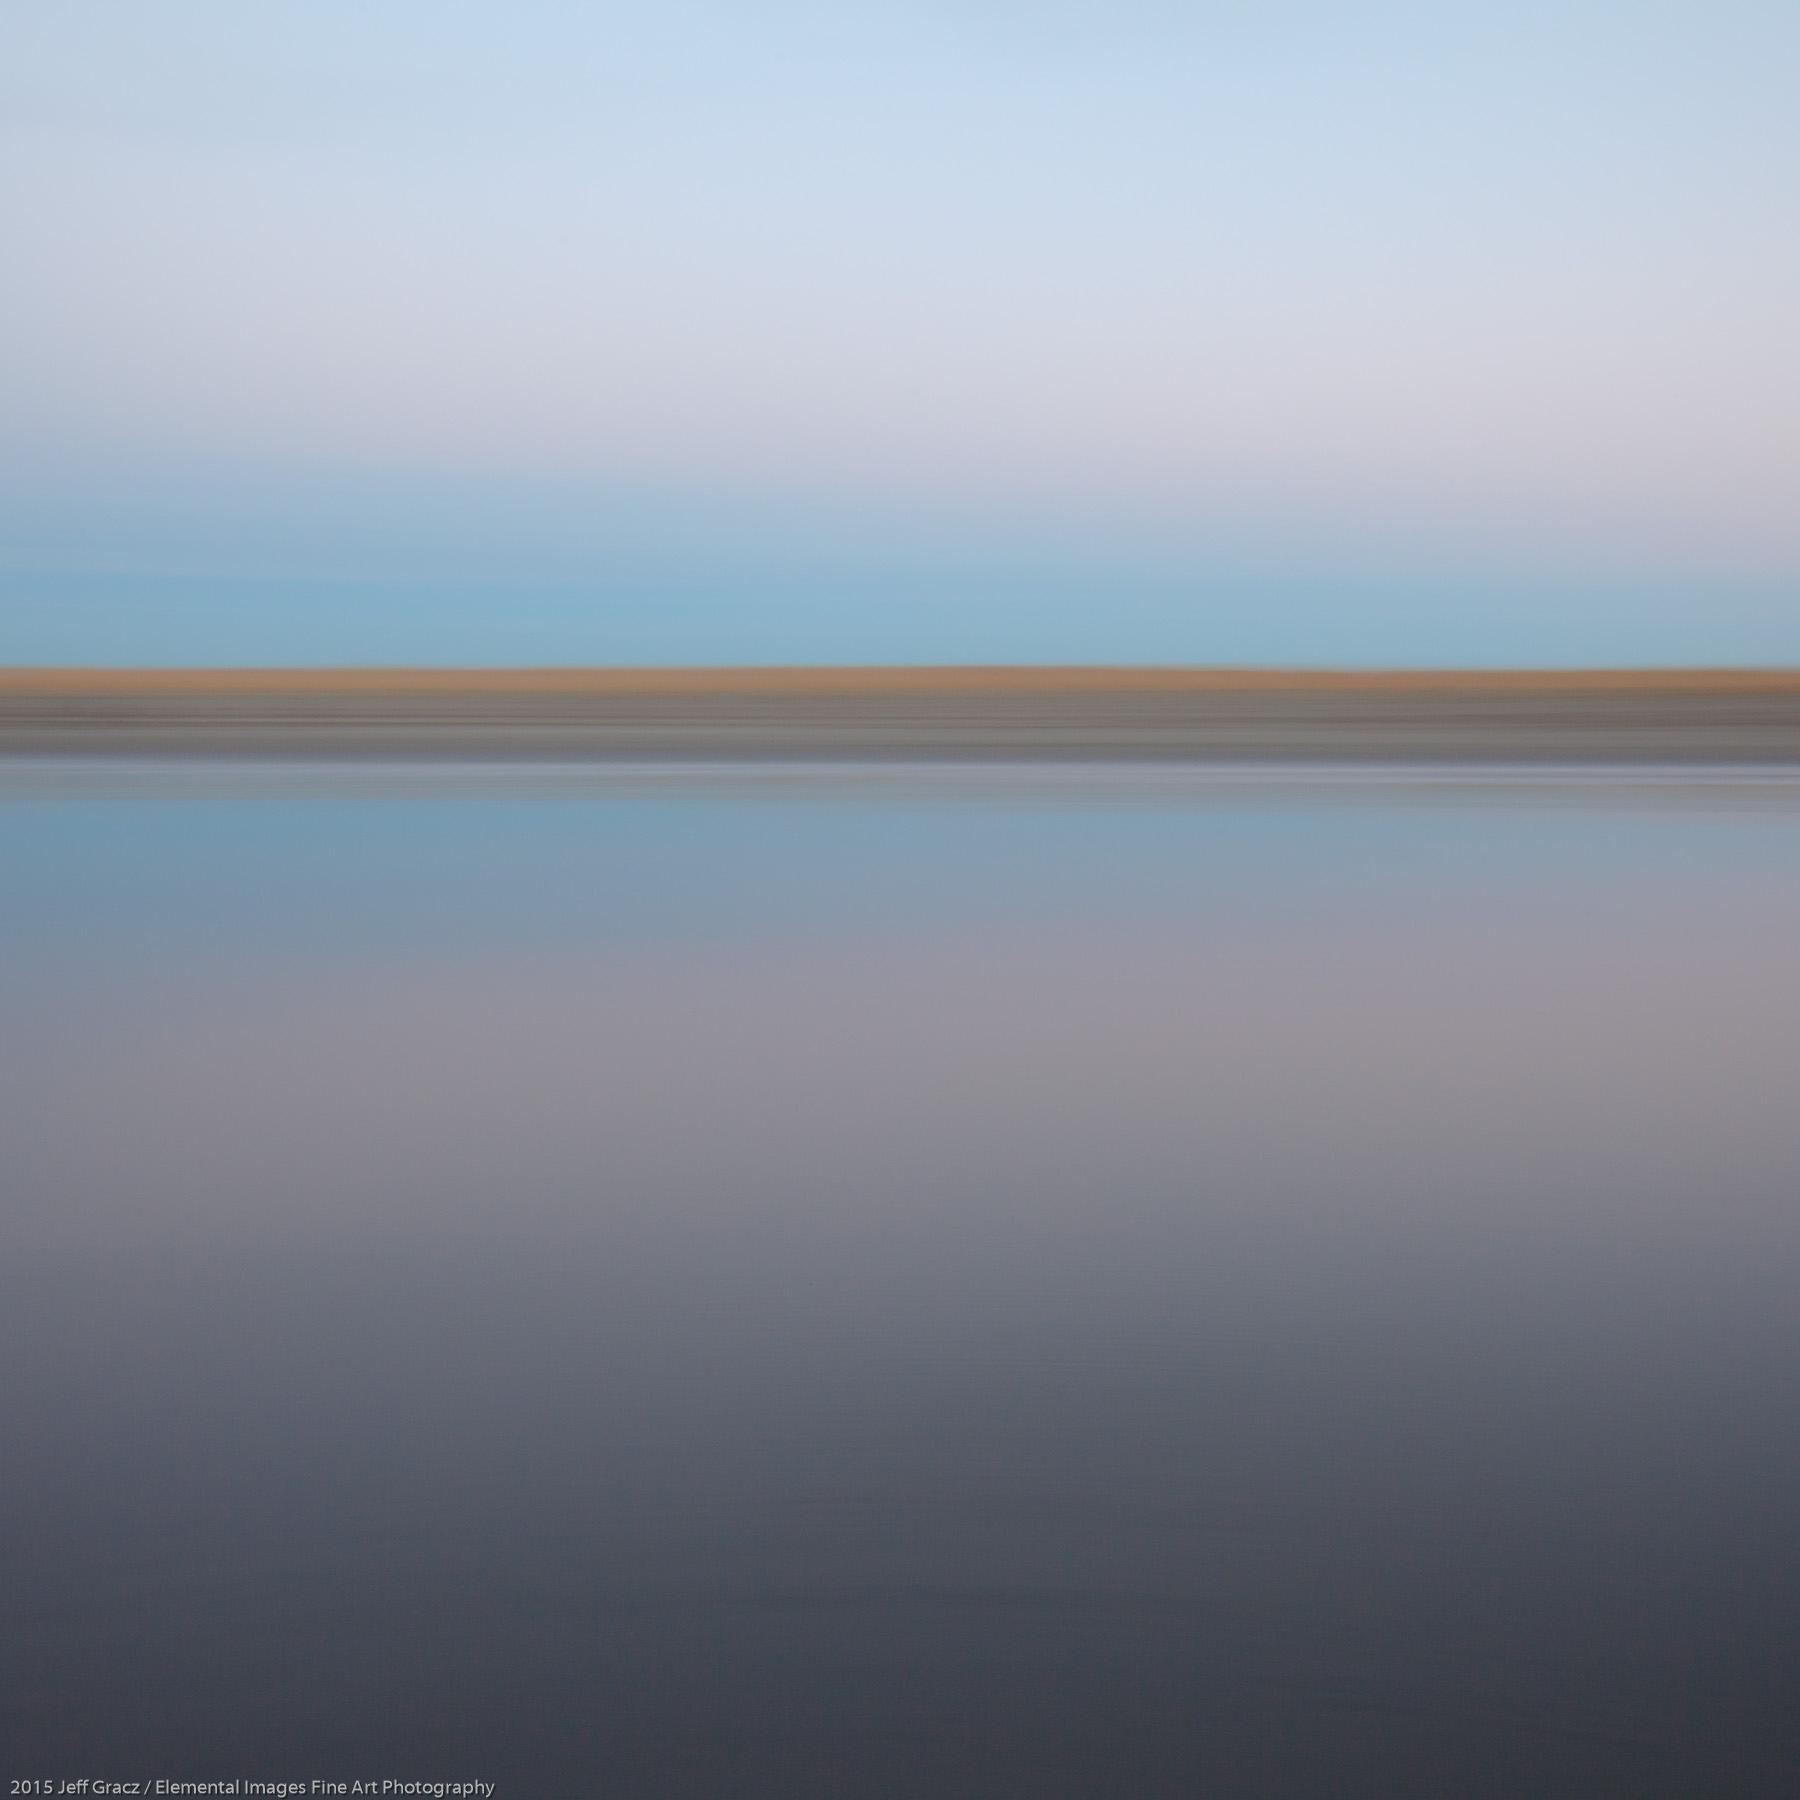 Sea and Sky LIII   Long Beach   WA   USA - © 2015 Jeff Gracz / Elemental Images Fine Art Photography - All Rights Reserved Worldwide